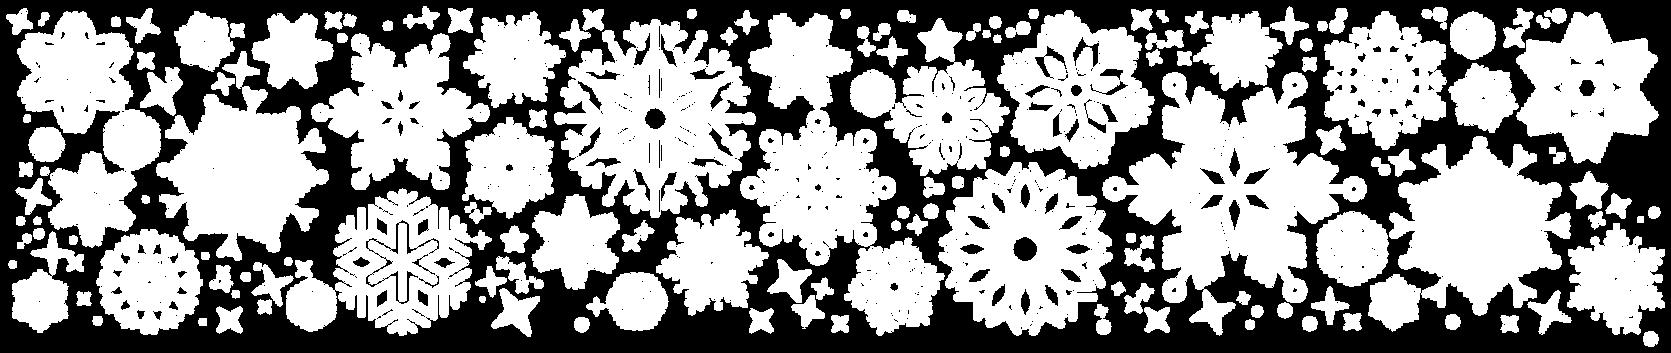 SnowBG-05.png